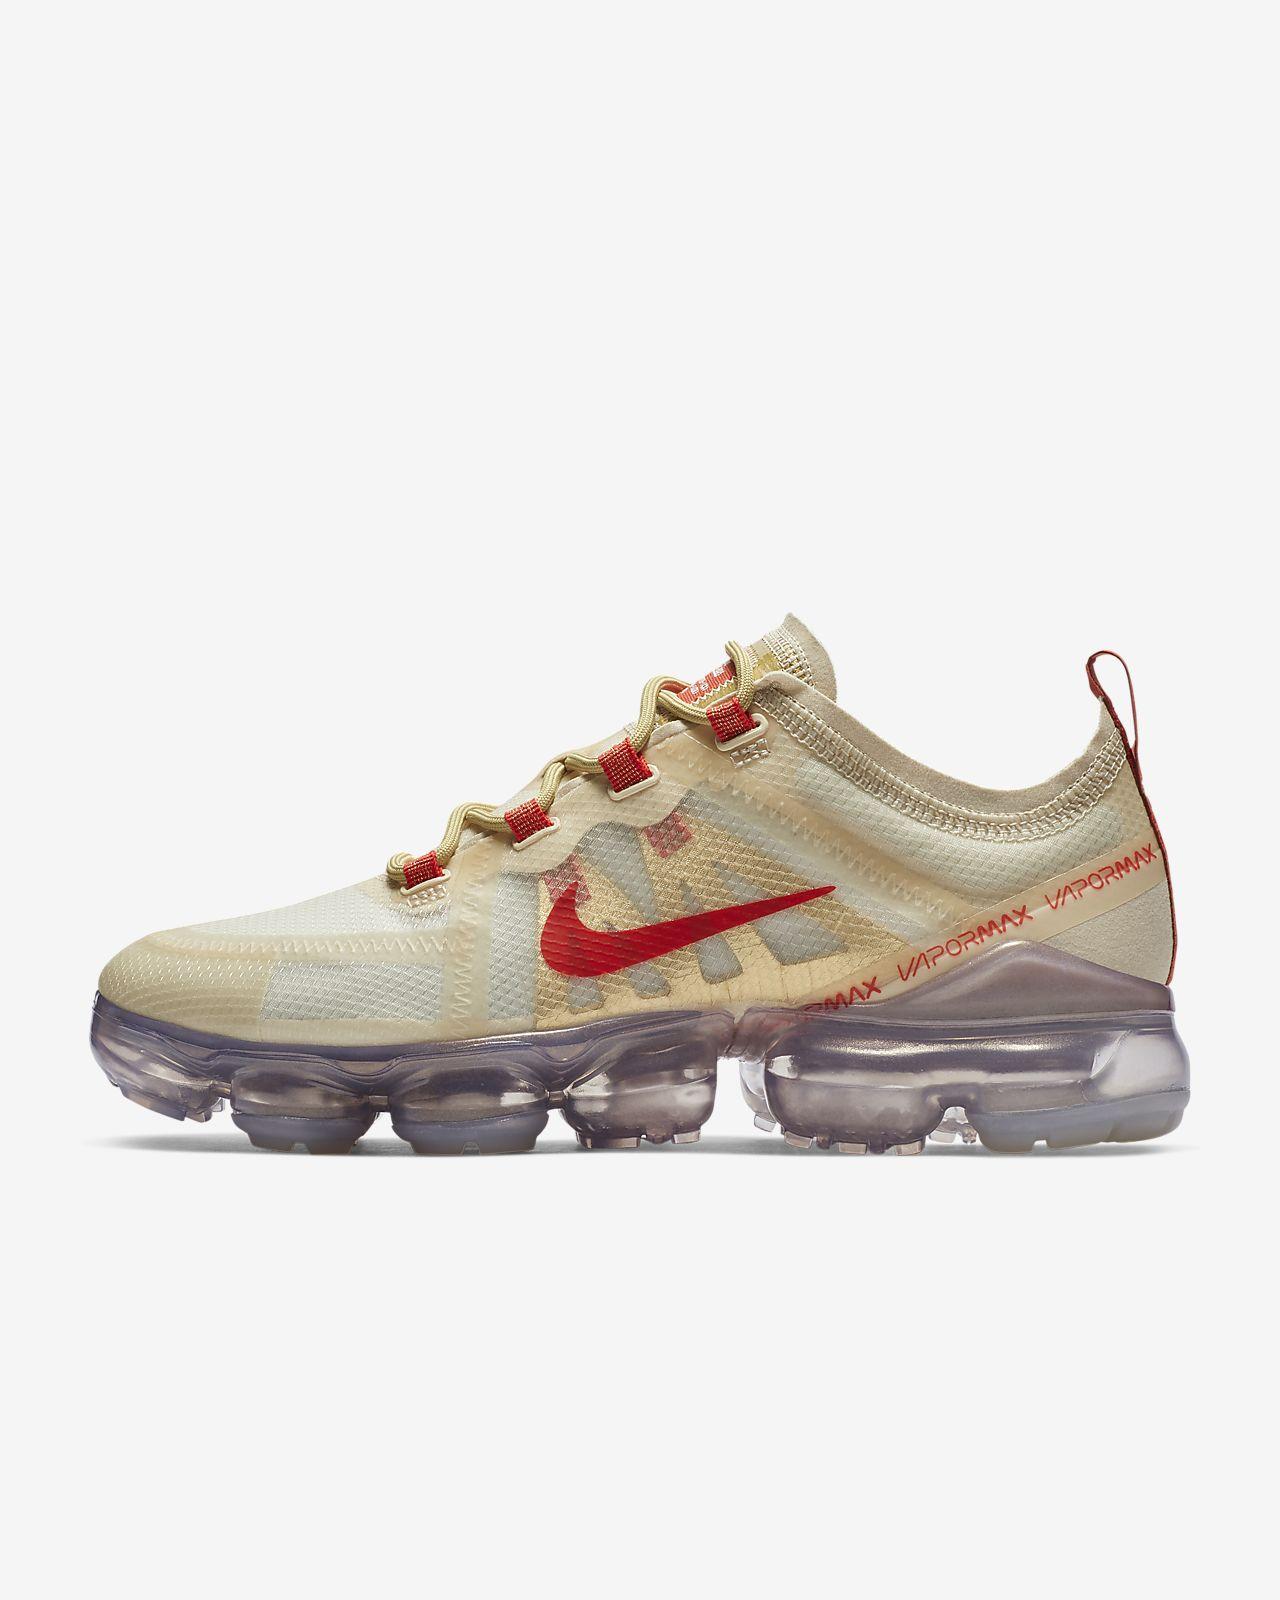 65666e20e1a Nike Air VaporMax 2019 CNY Women s Shoe. Nike.com ZA